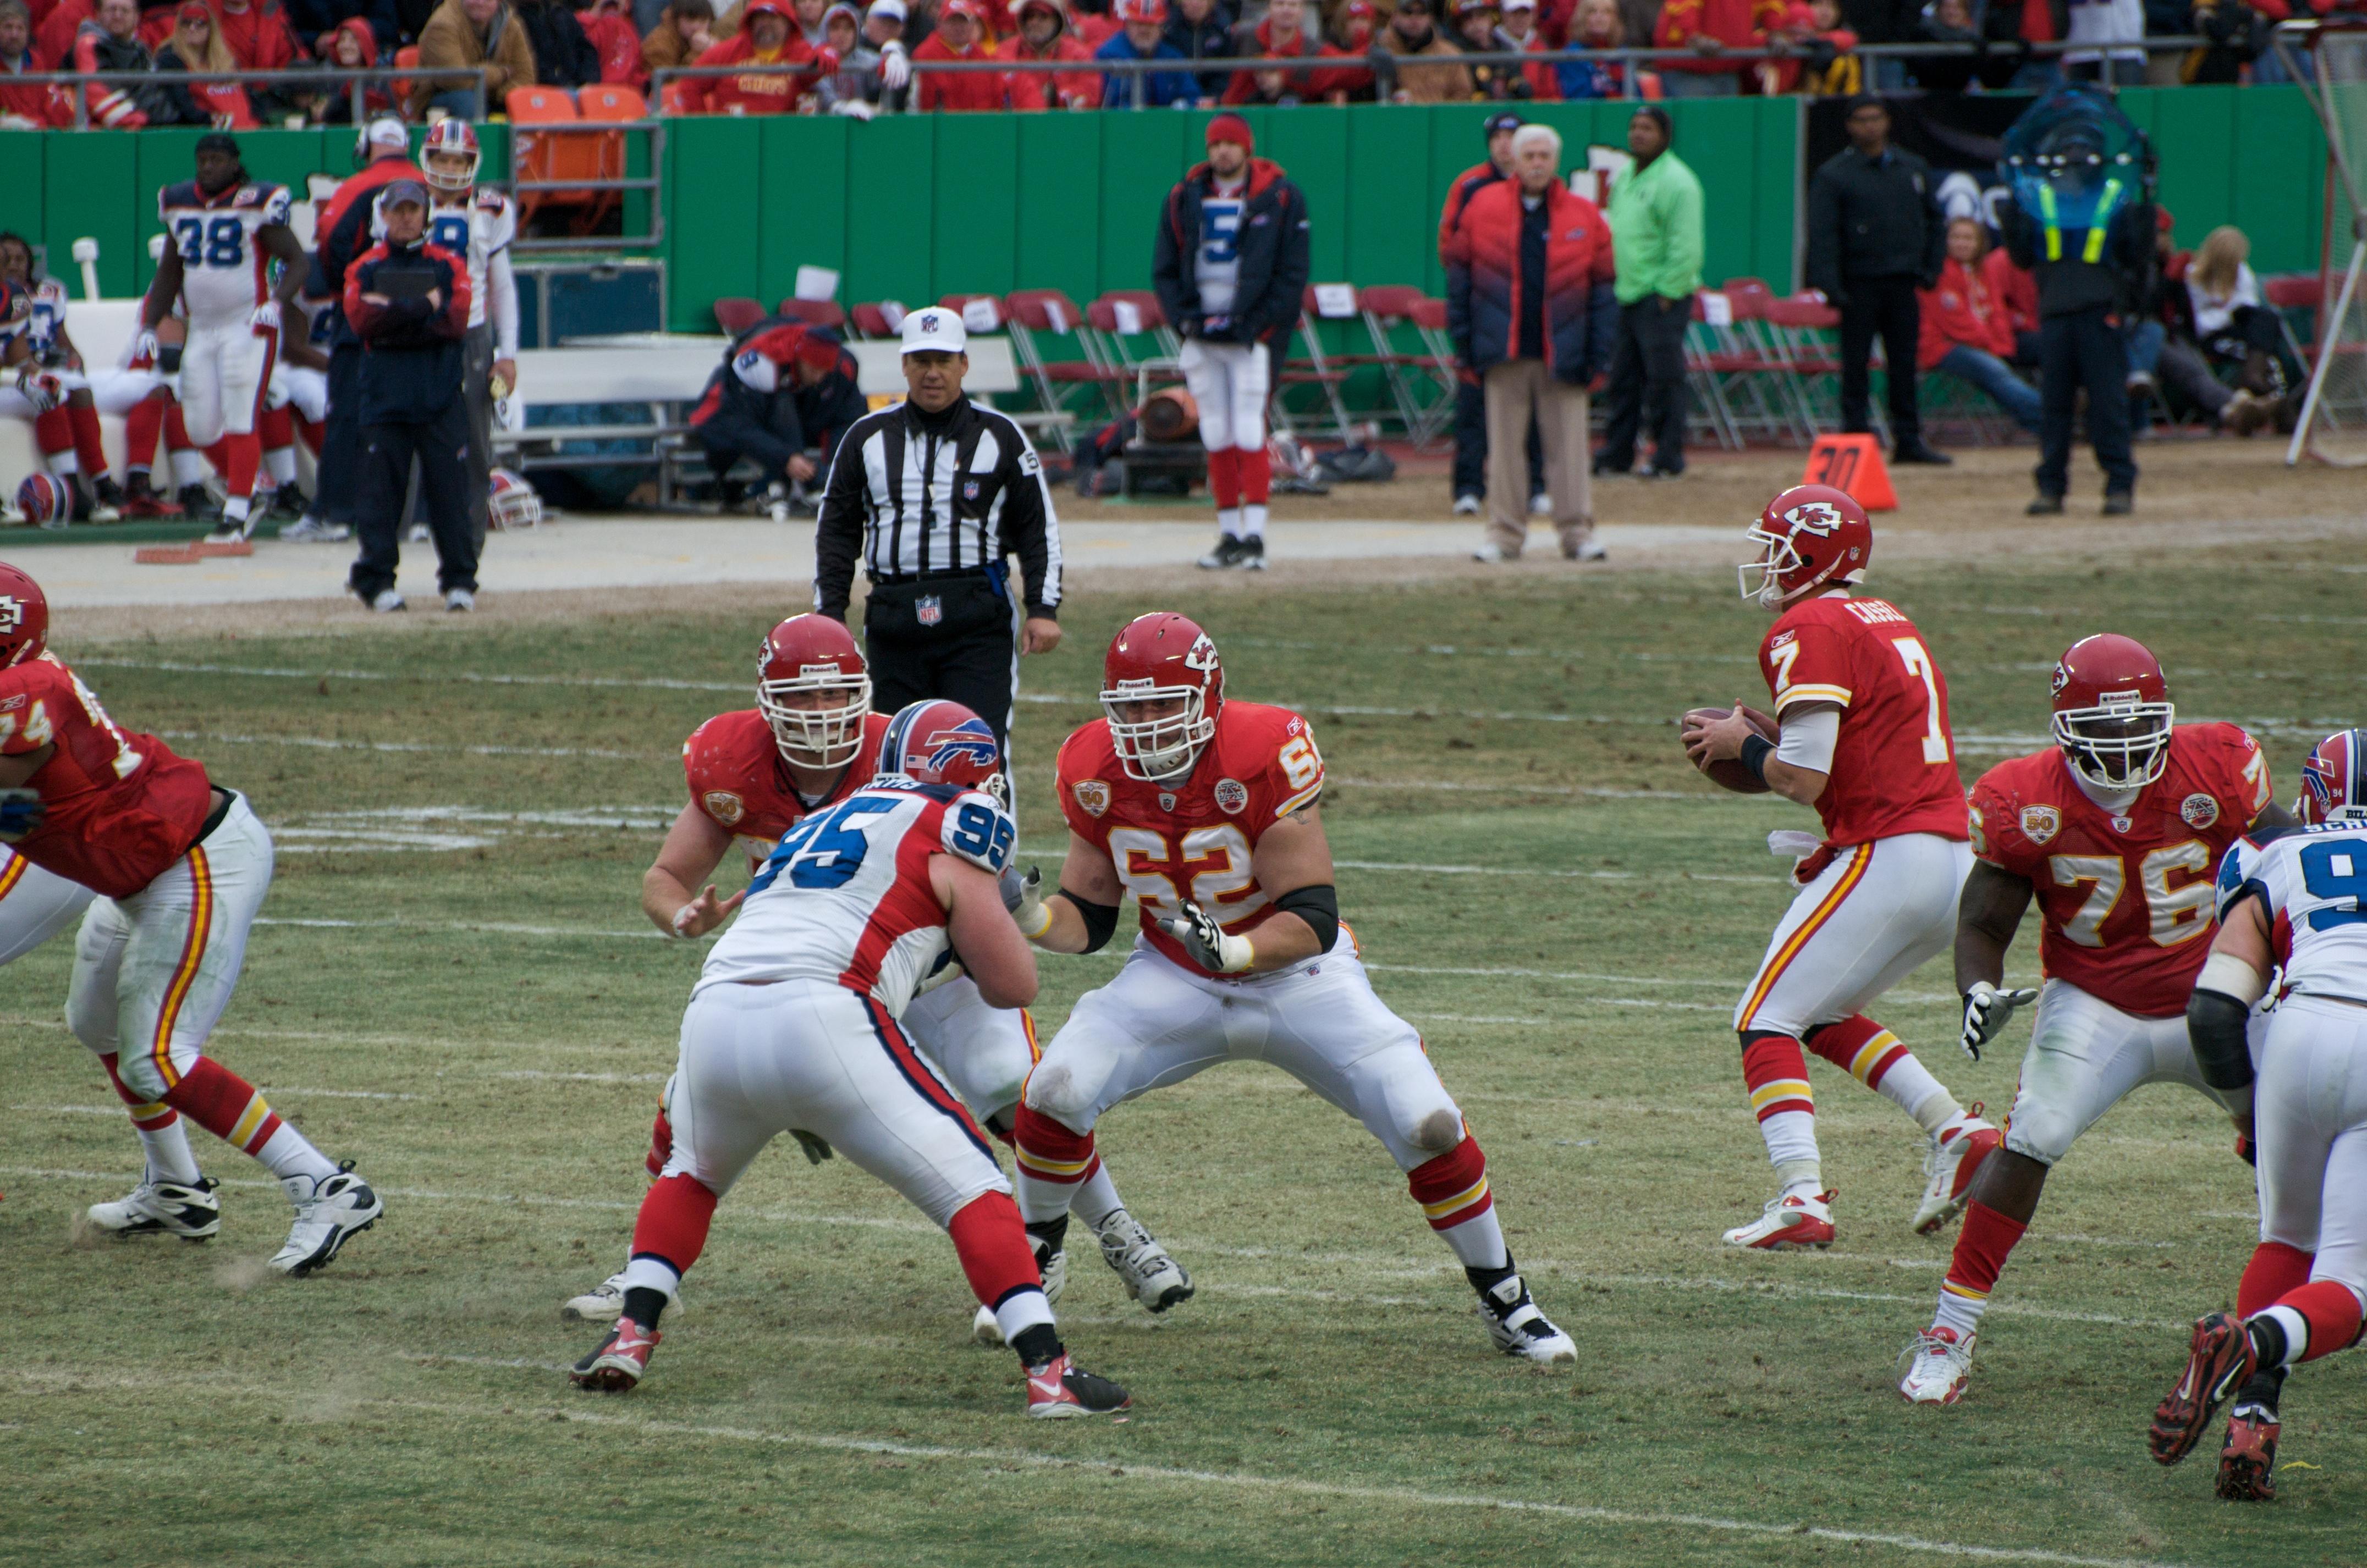 Andy Alleman (#62), Branden Albert (#76), and Rudy Niswanger of the Kansas City Chiefs blocks for Matt Cassel (#7) in a game against the Buffalo Bills at Arrowhead Stadium on December 13, 2009